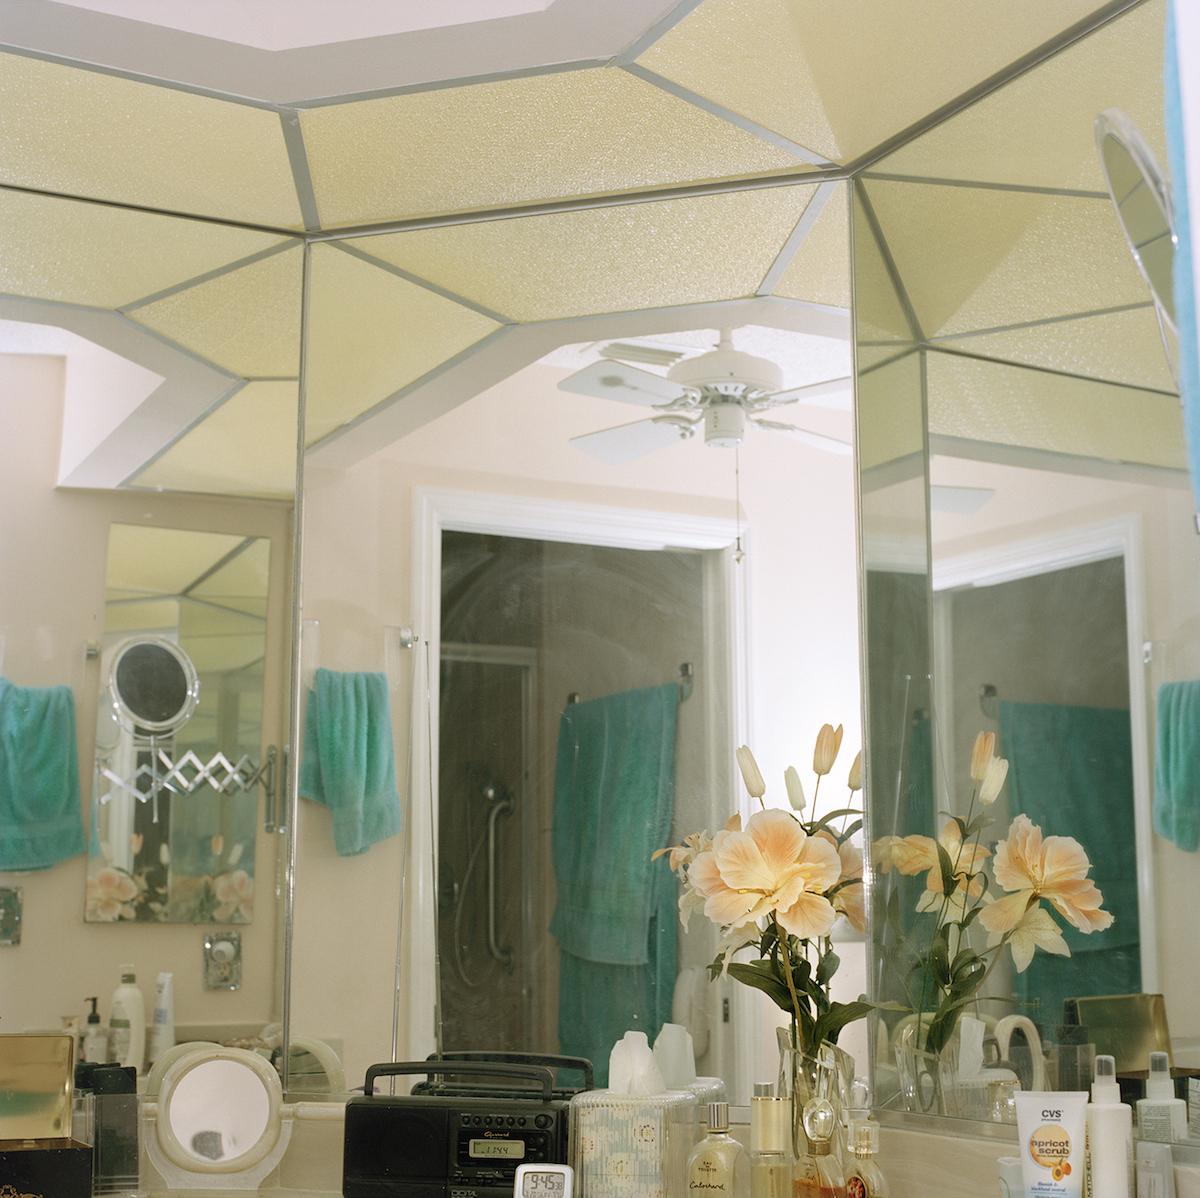 YM Grannysbathroom 2016 Wksp